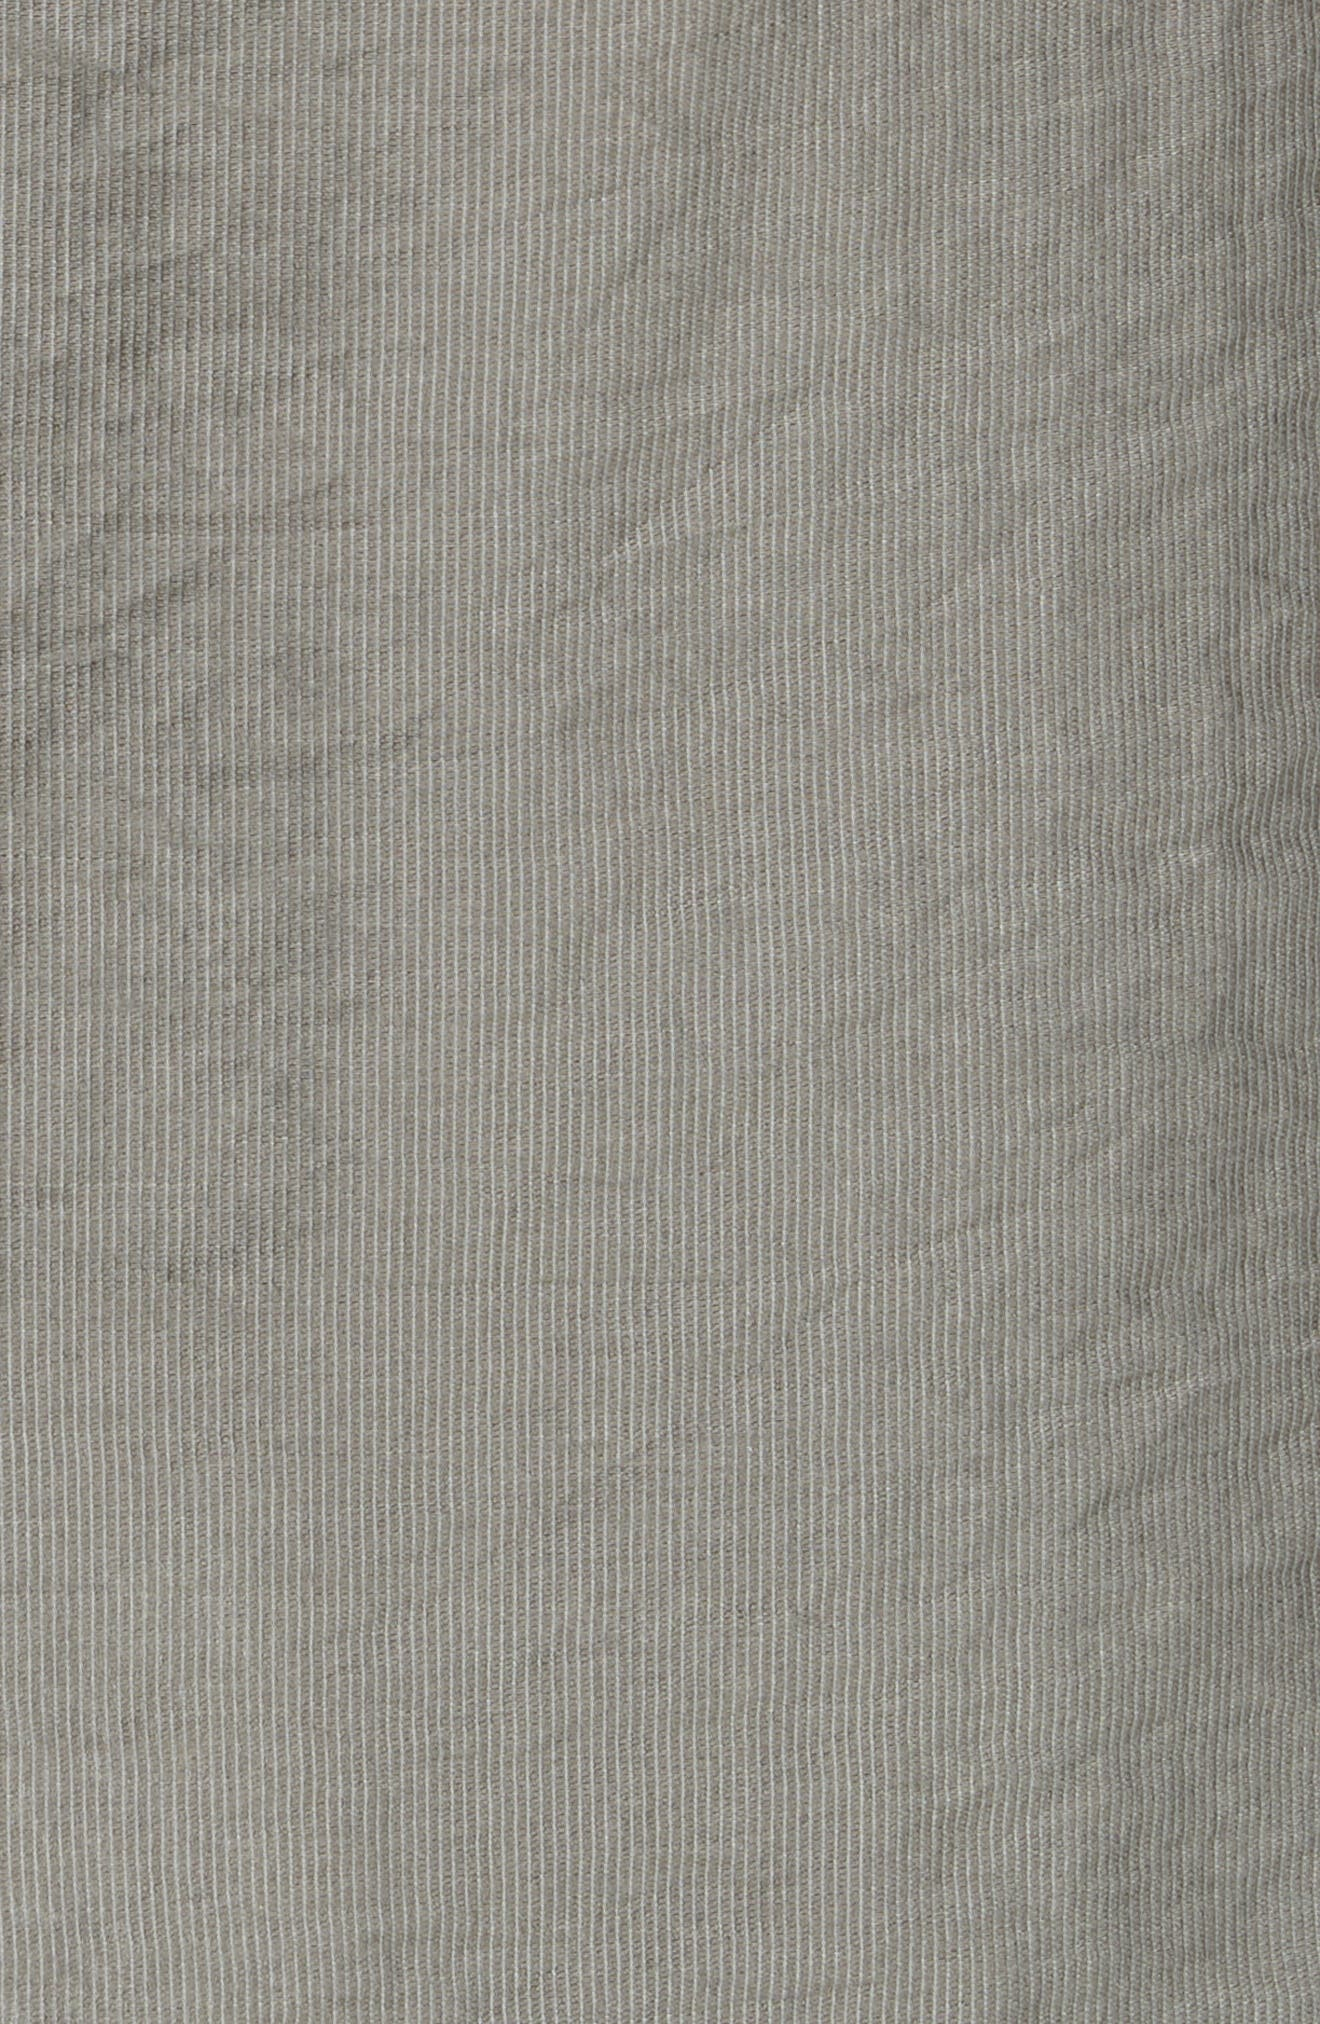 Erlecia Wrap Skirt,                             Alternate thumbnail 5, color,                             330